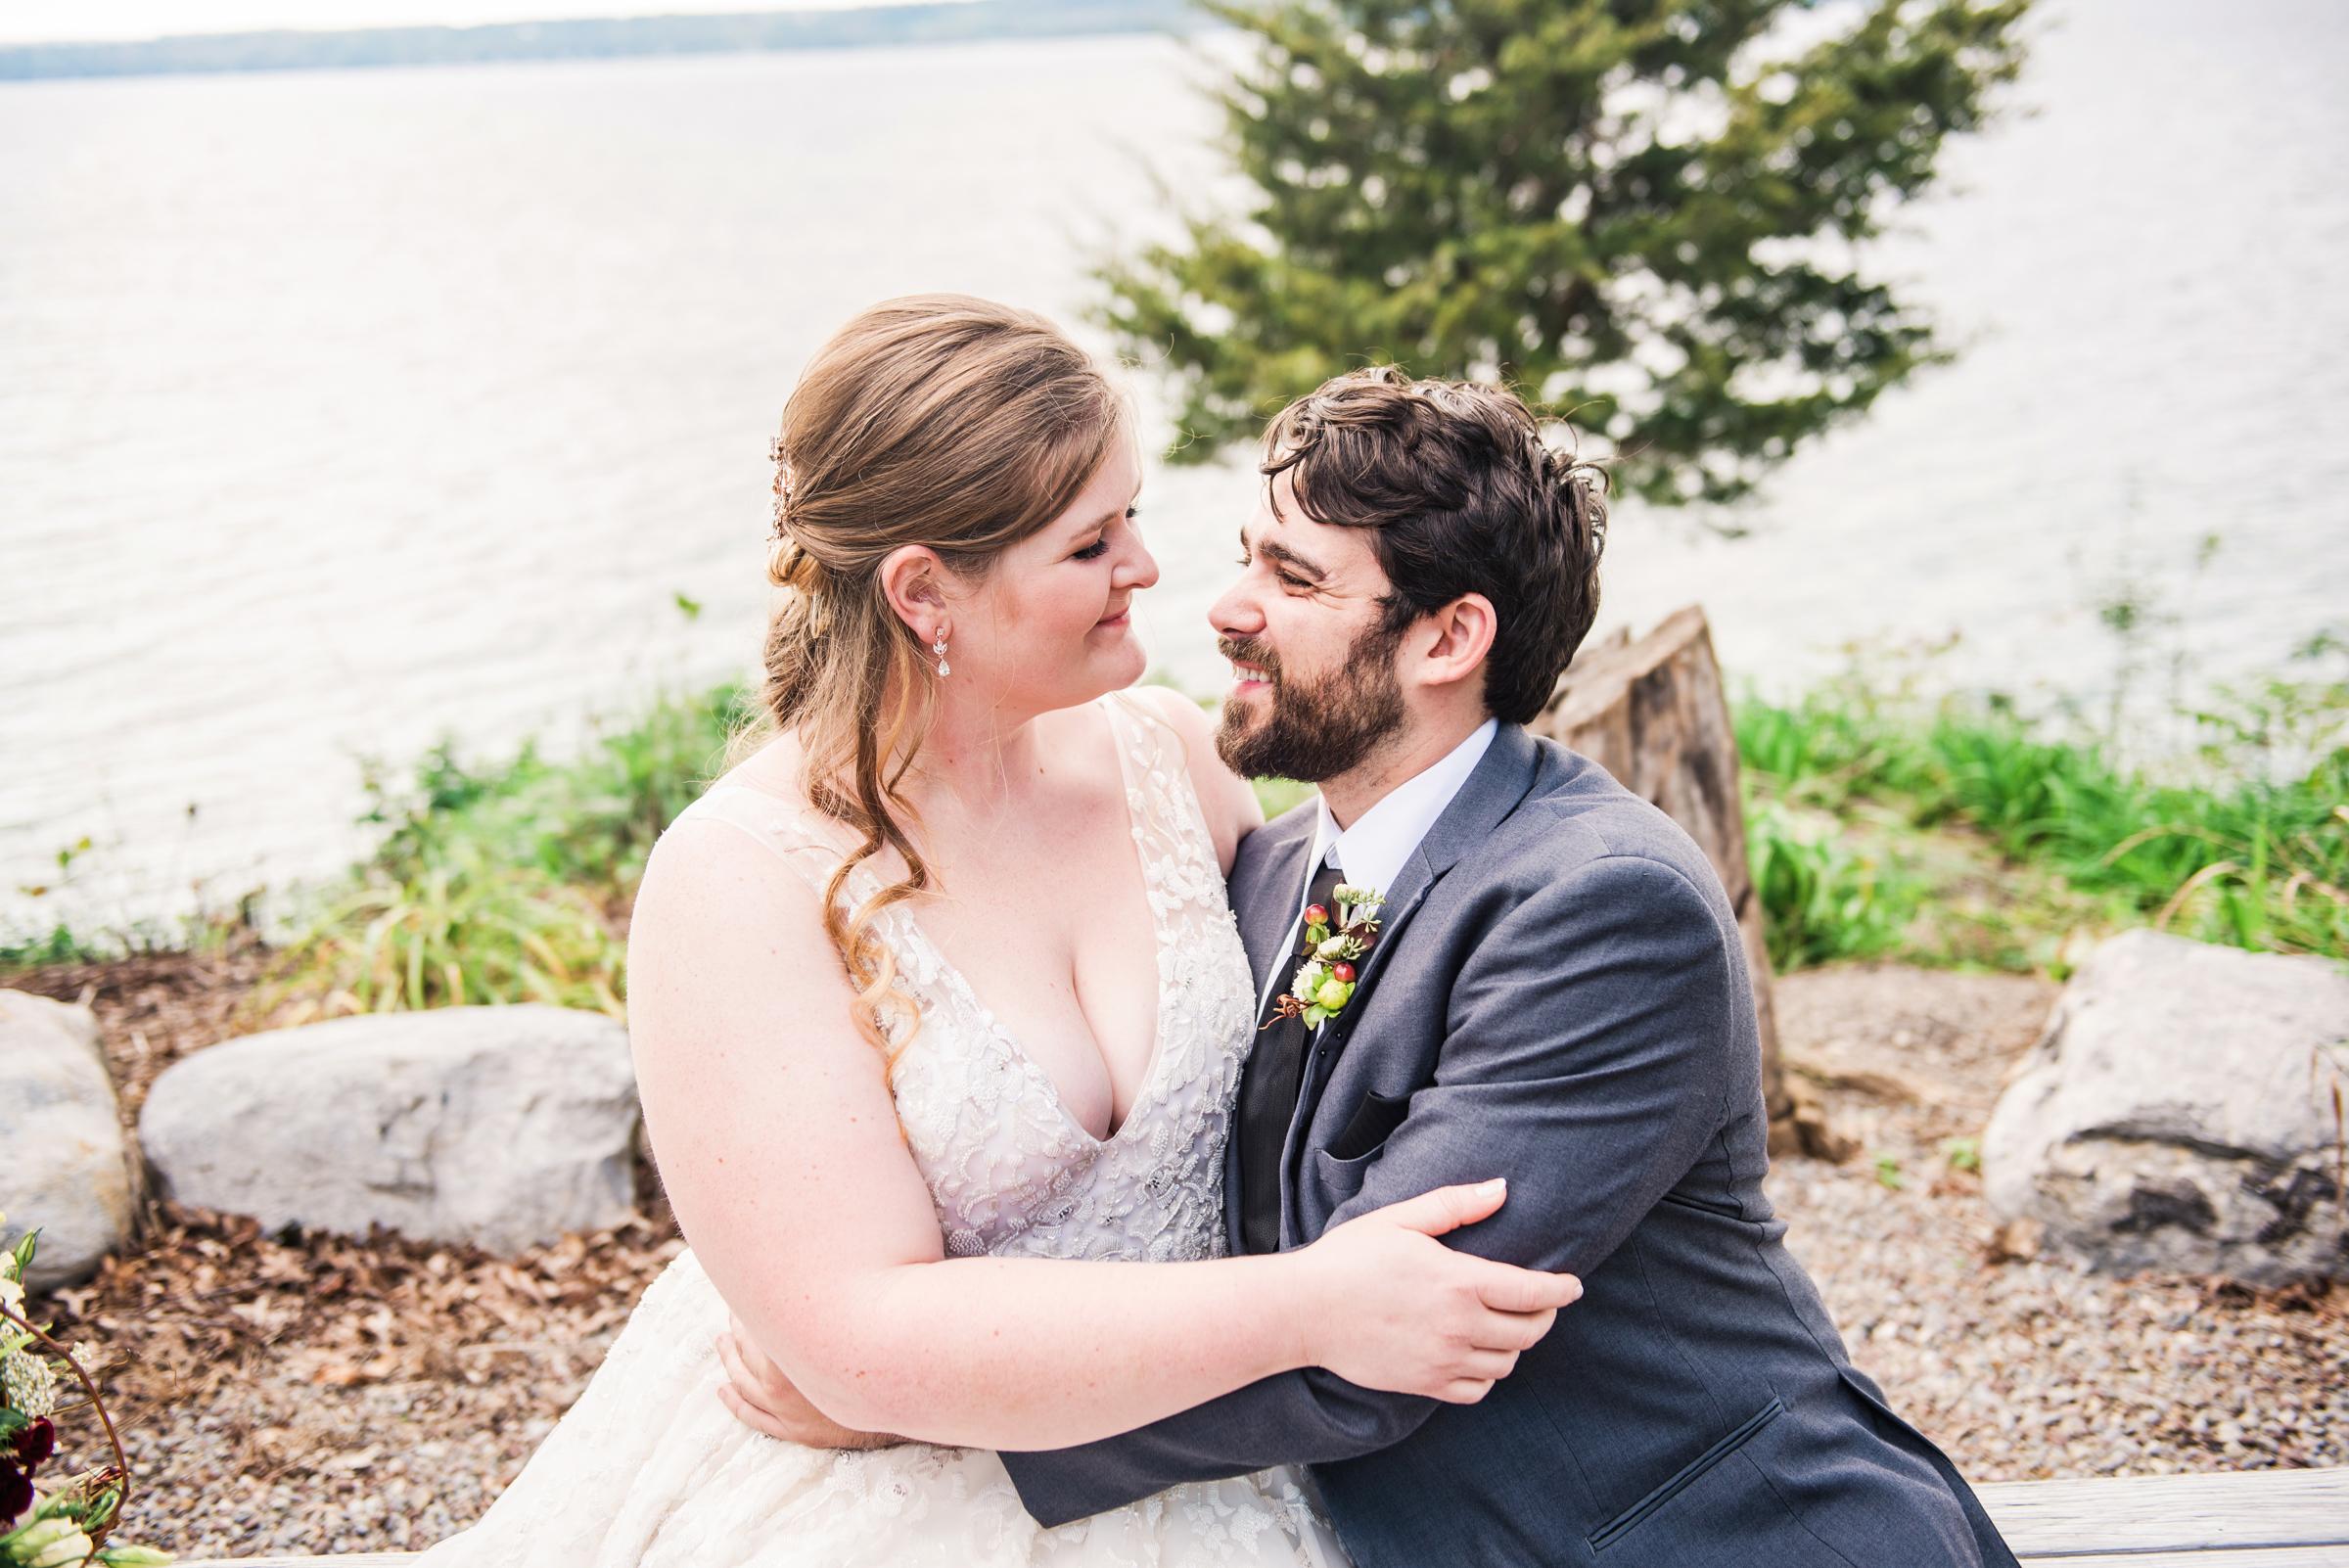 Zugibe_Vineyards_Finger_Lakes_Wedding_JILL_STUDIO_Rochester_NY_Photographer_DSC_3527.jpg